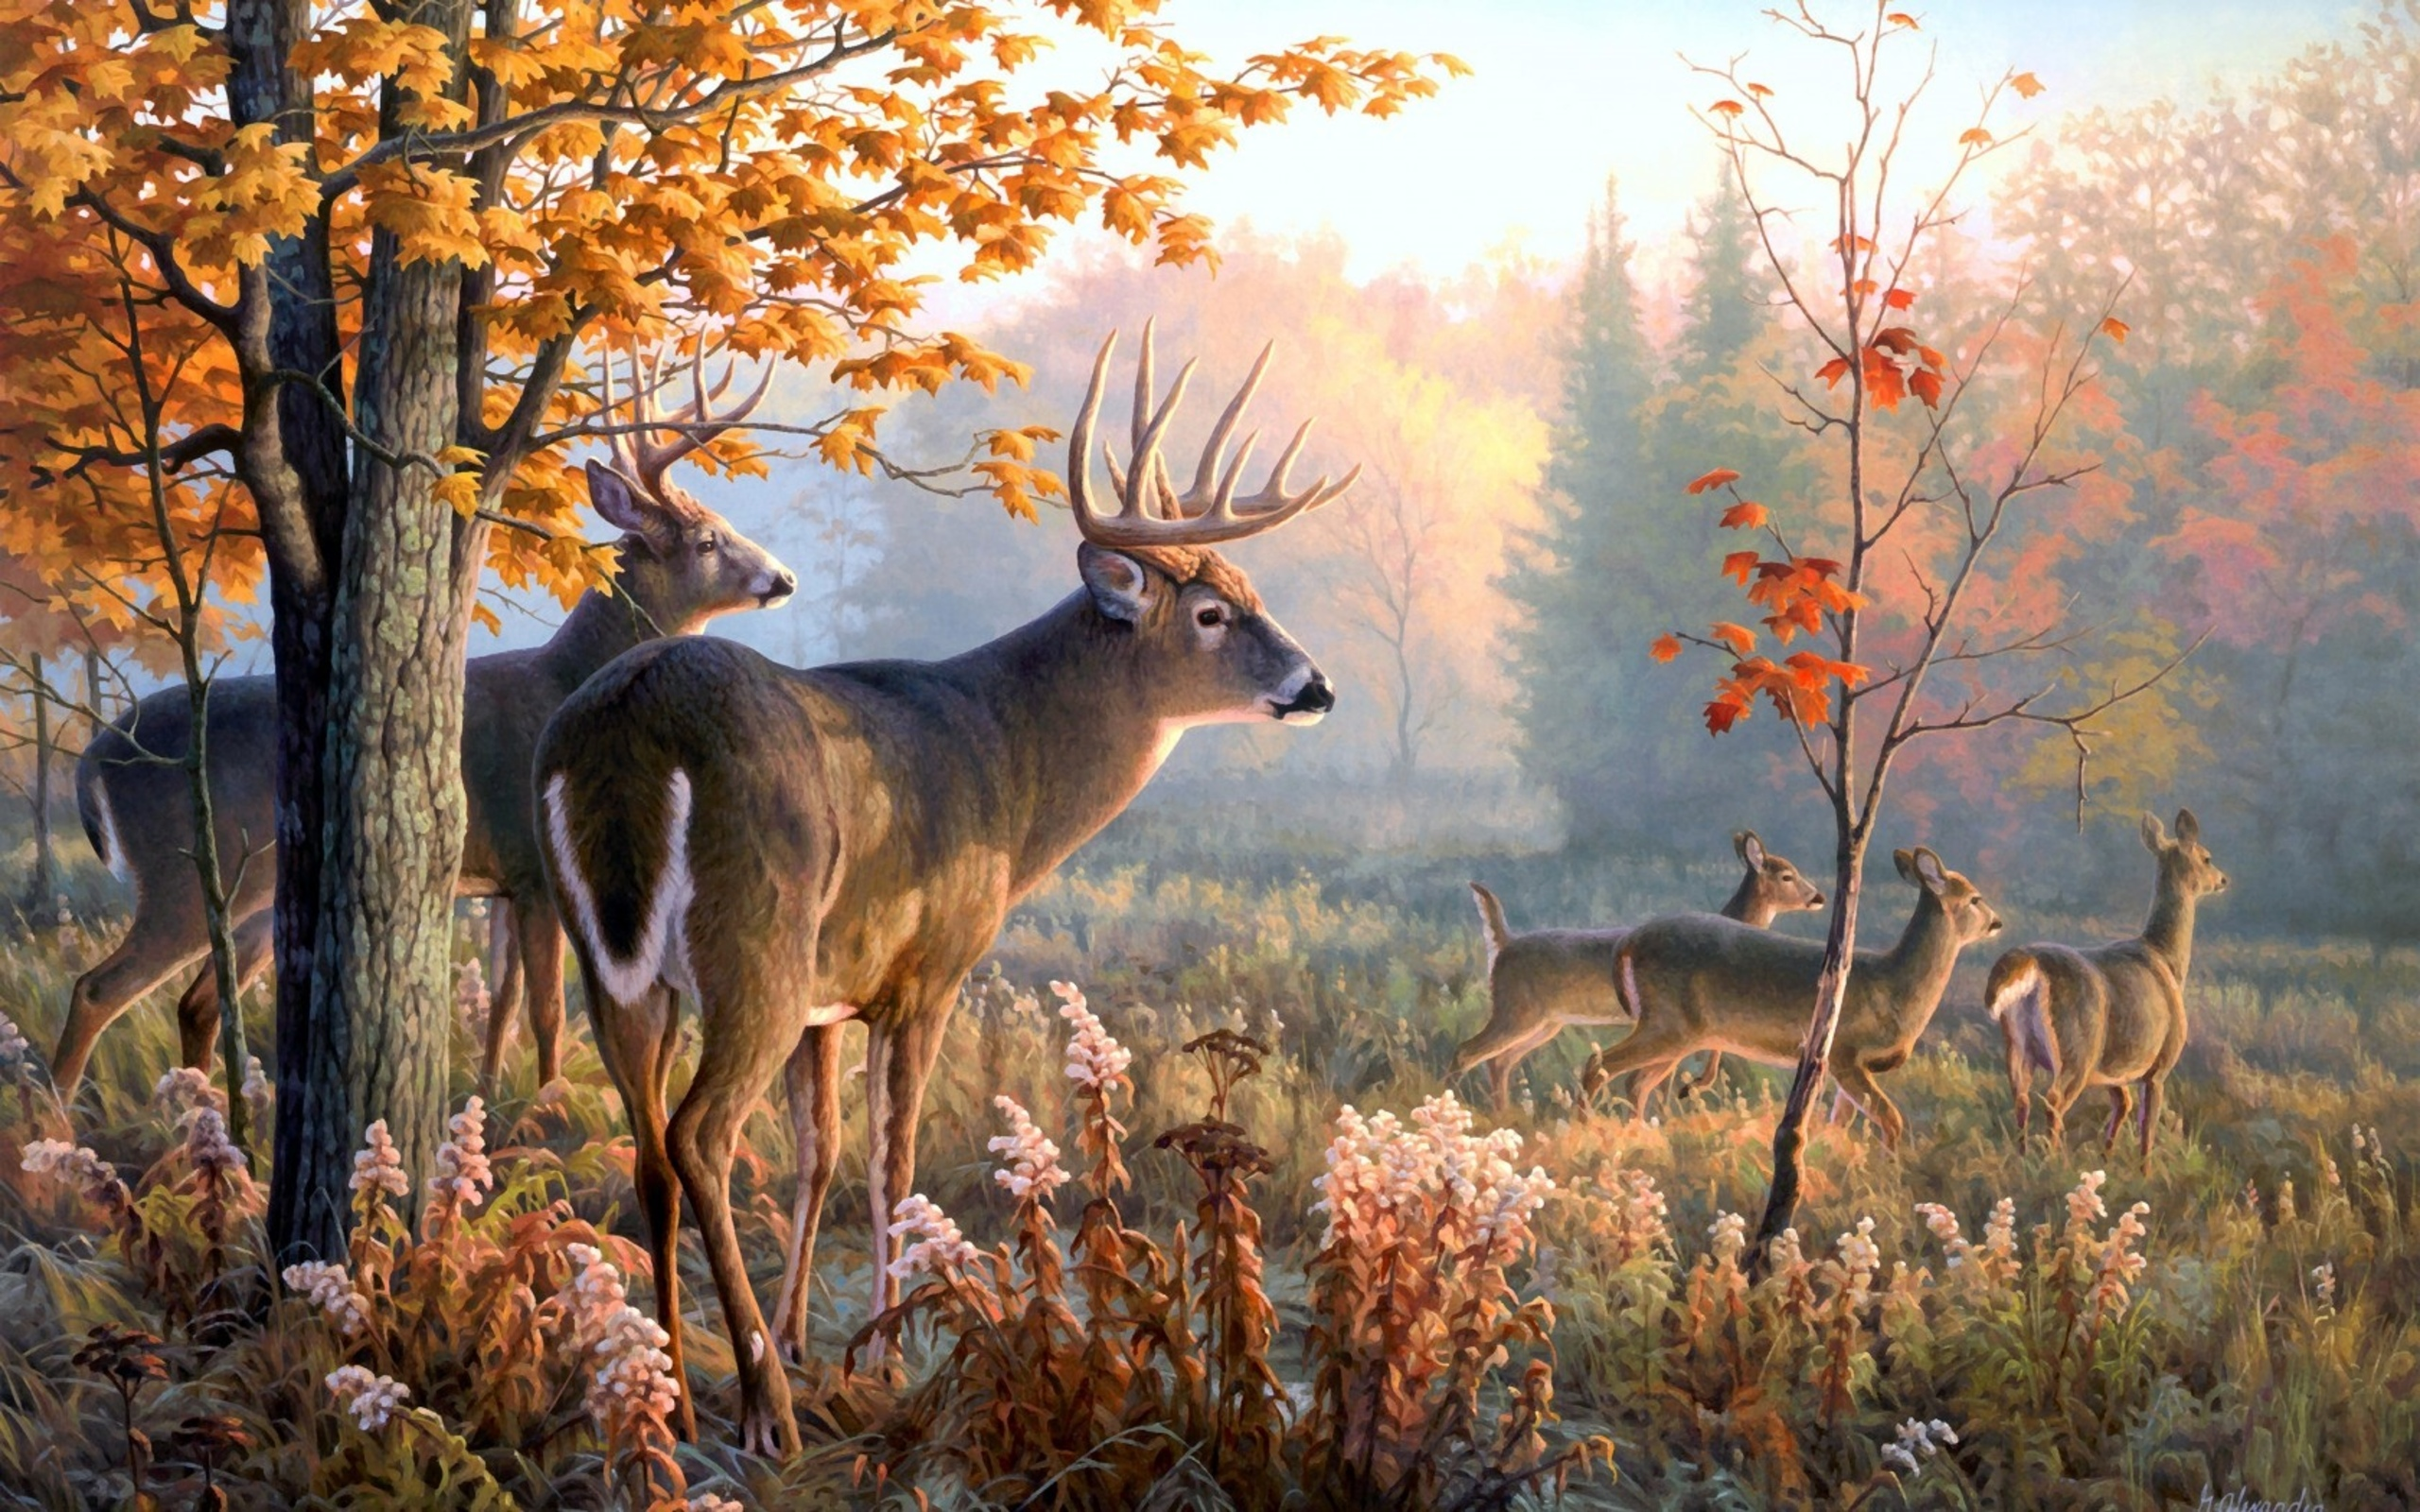 Mobile Wallpaper Inspirational Quotes Free Deer Backgrounds Pixelstalk Net